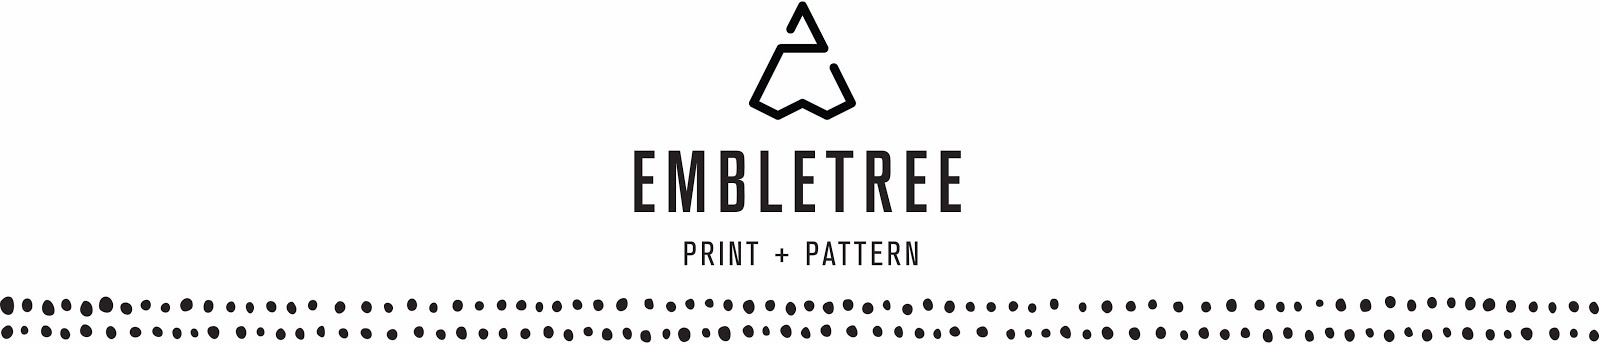 Embletree